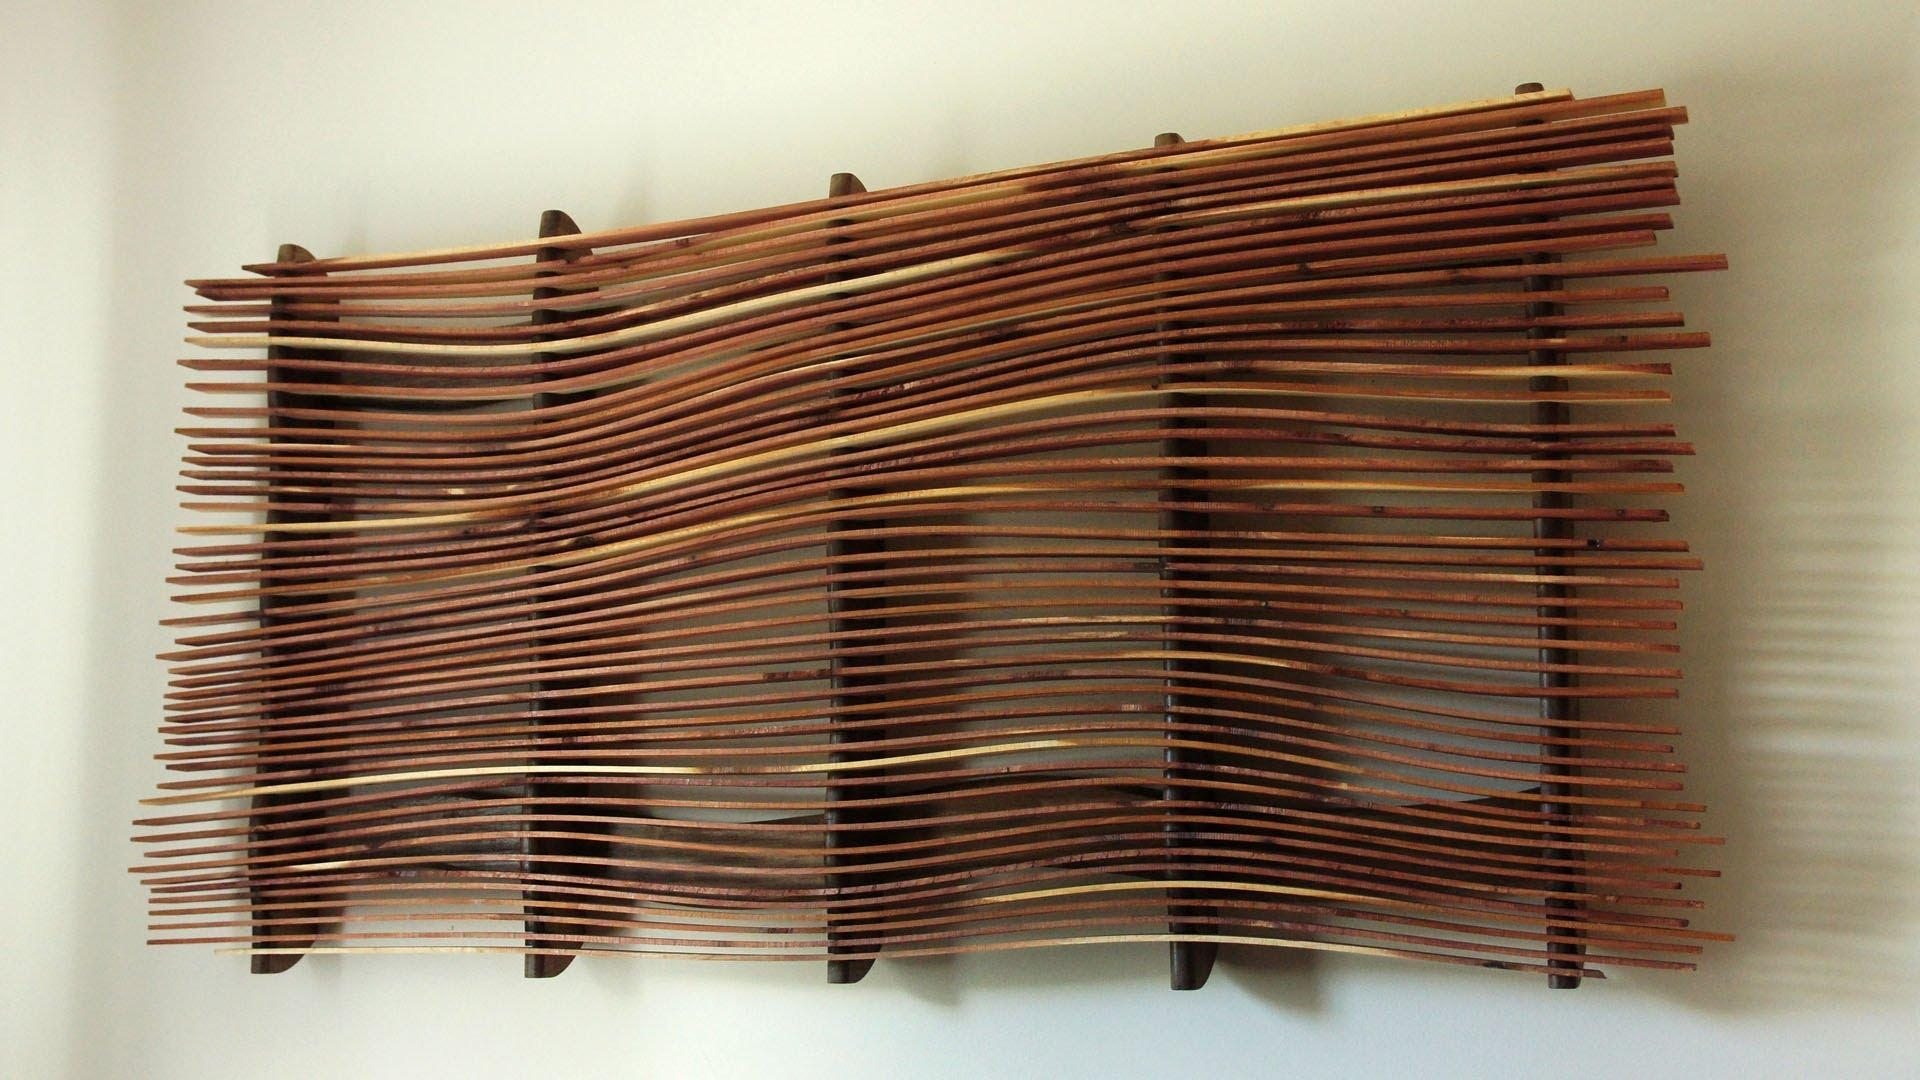 Wall Art Designs: Wood Wall Hangings Art Wooden Wall Hangings Intended For Natural Wood Wall Art (Image 16 of 20)